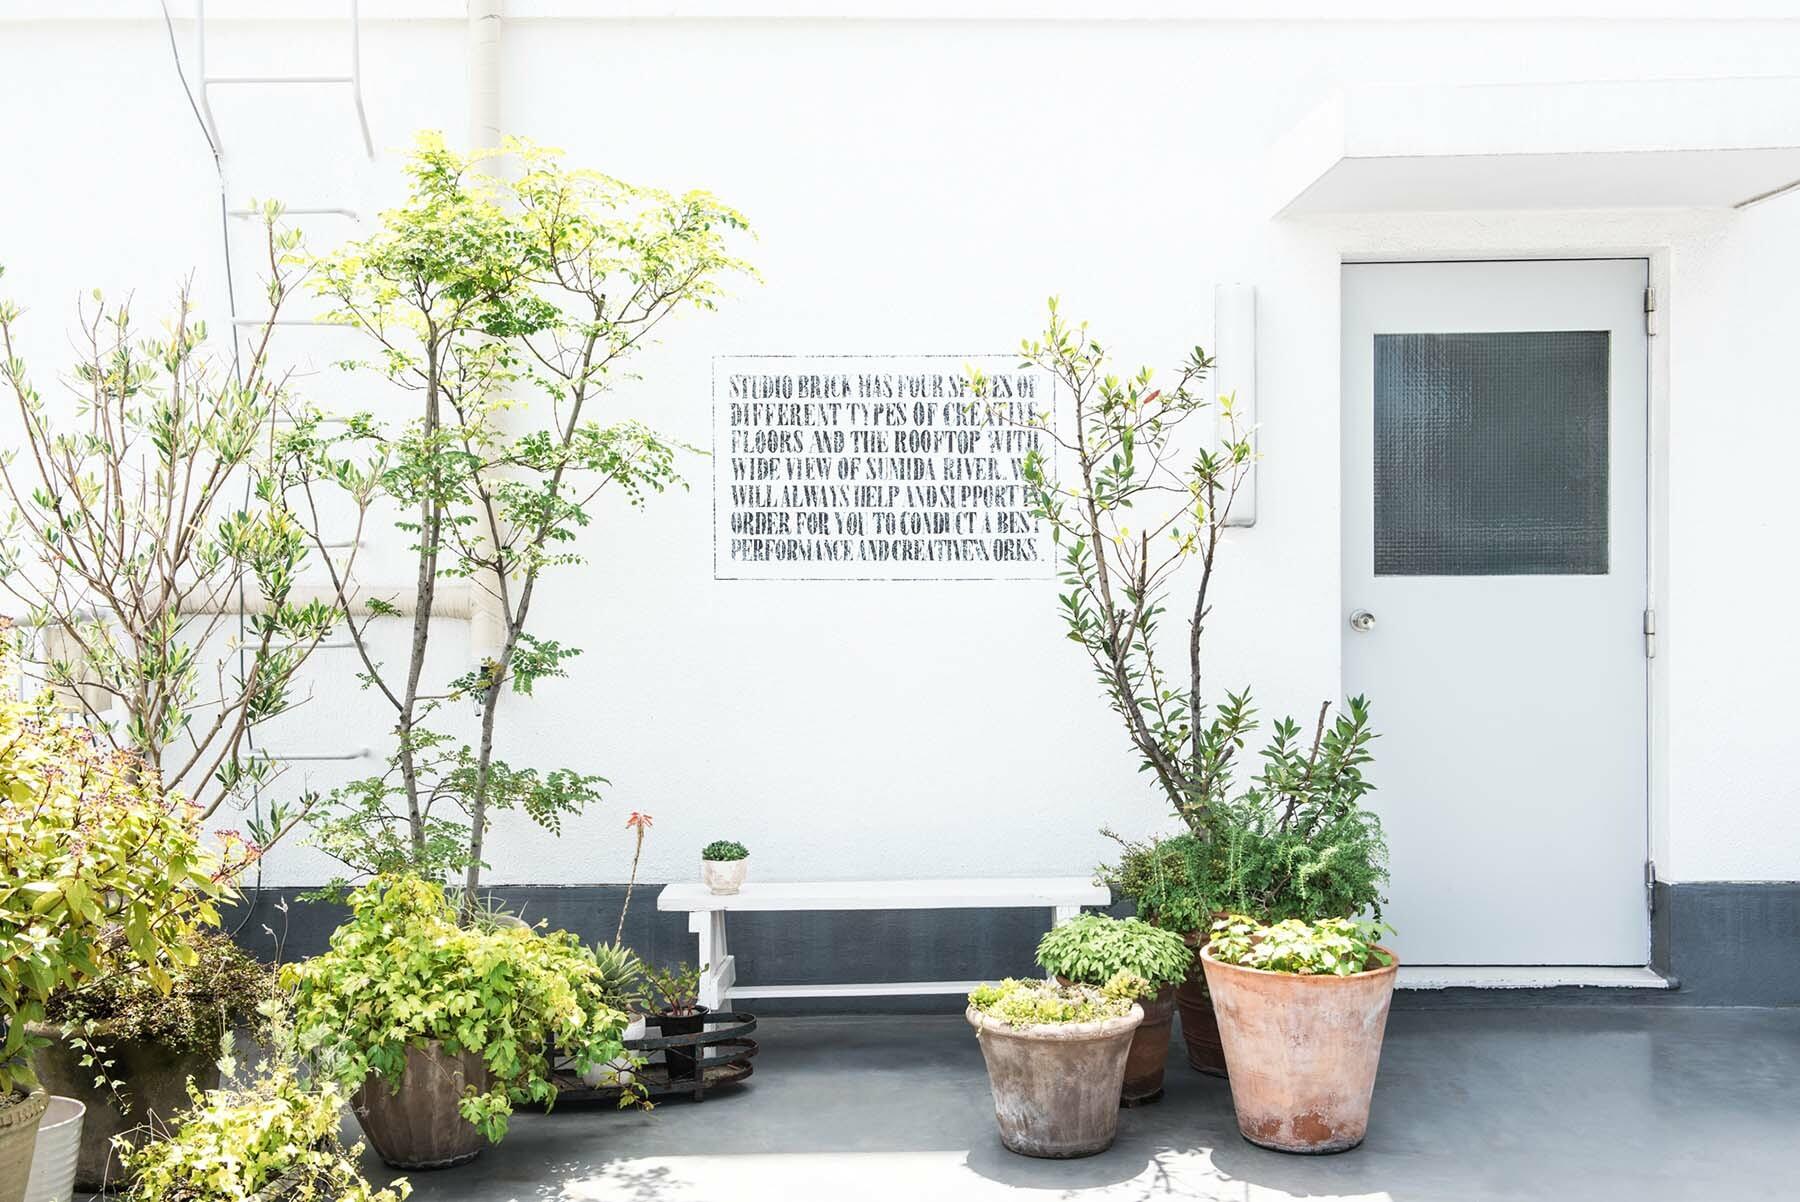 StudioBRICK RF (スタジオブリック八丁堀RF)植栽も豊富です(無料)